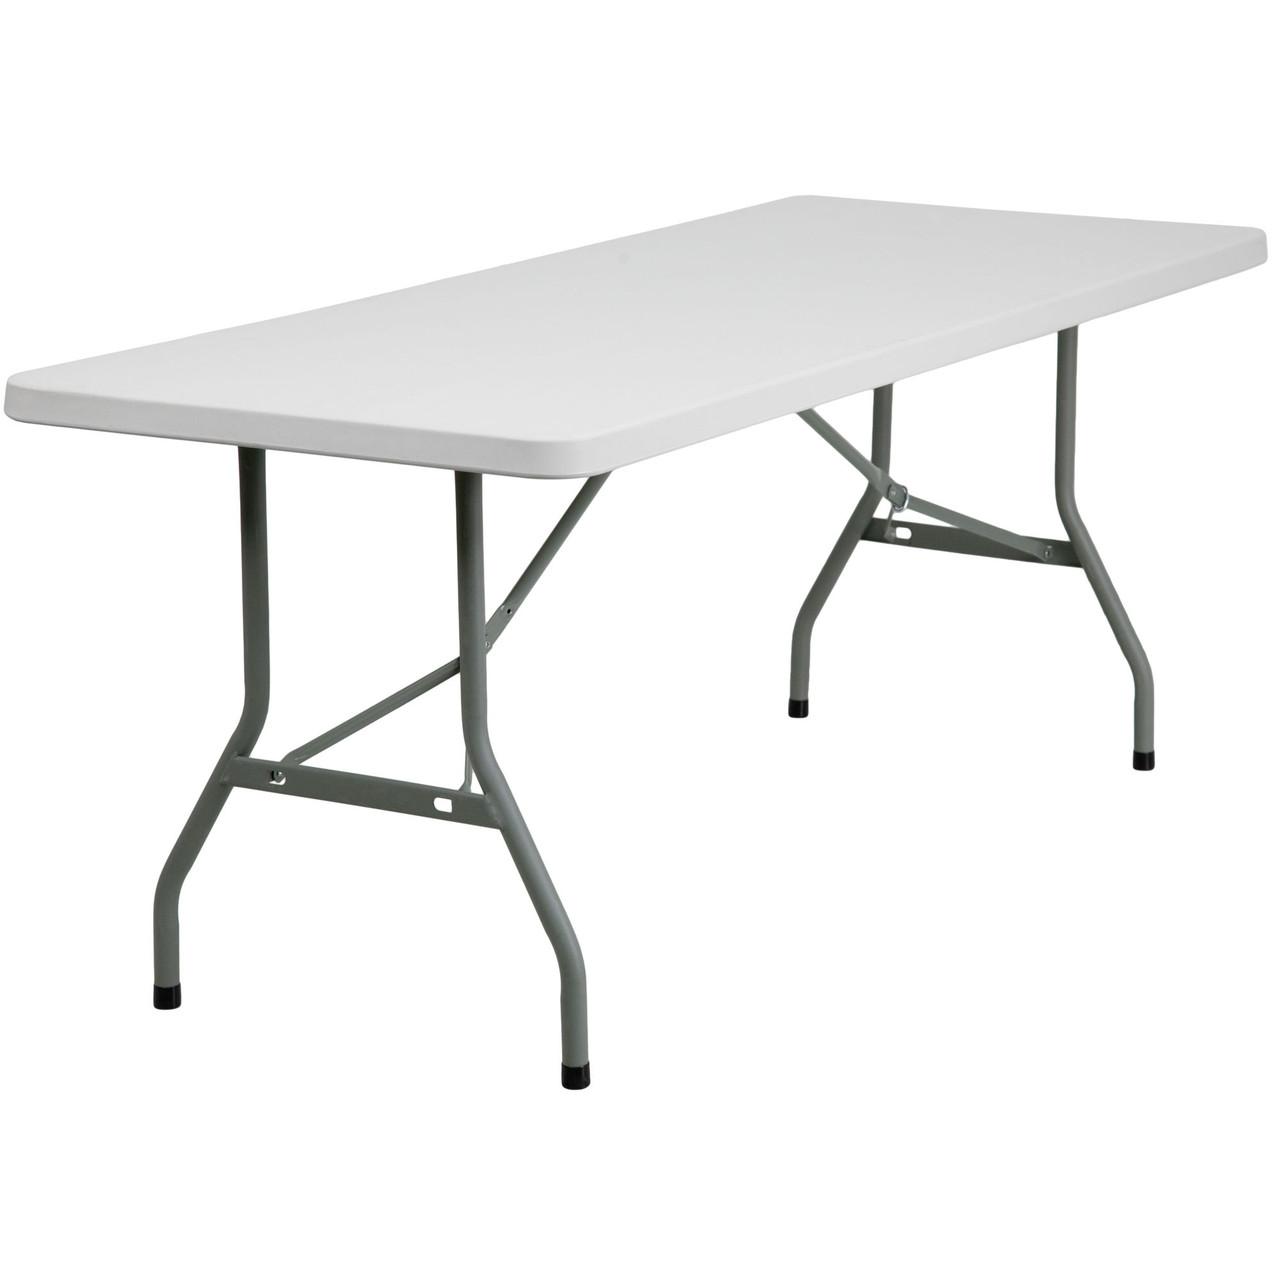 Peachy 6 Ft Rectangular Plastic Folding Banquet Tables Rb 3072 Gg Spiritservingveterans Wood Chair Design Ideas Spiritservingveteransorg